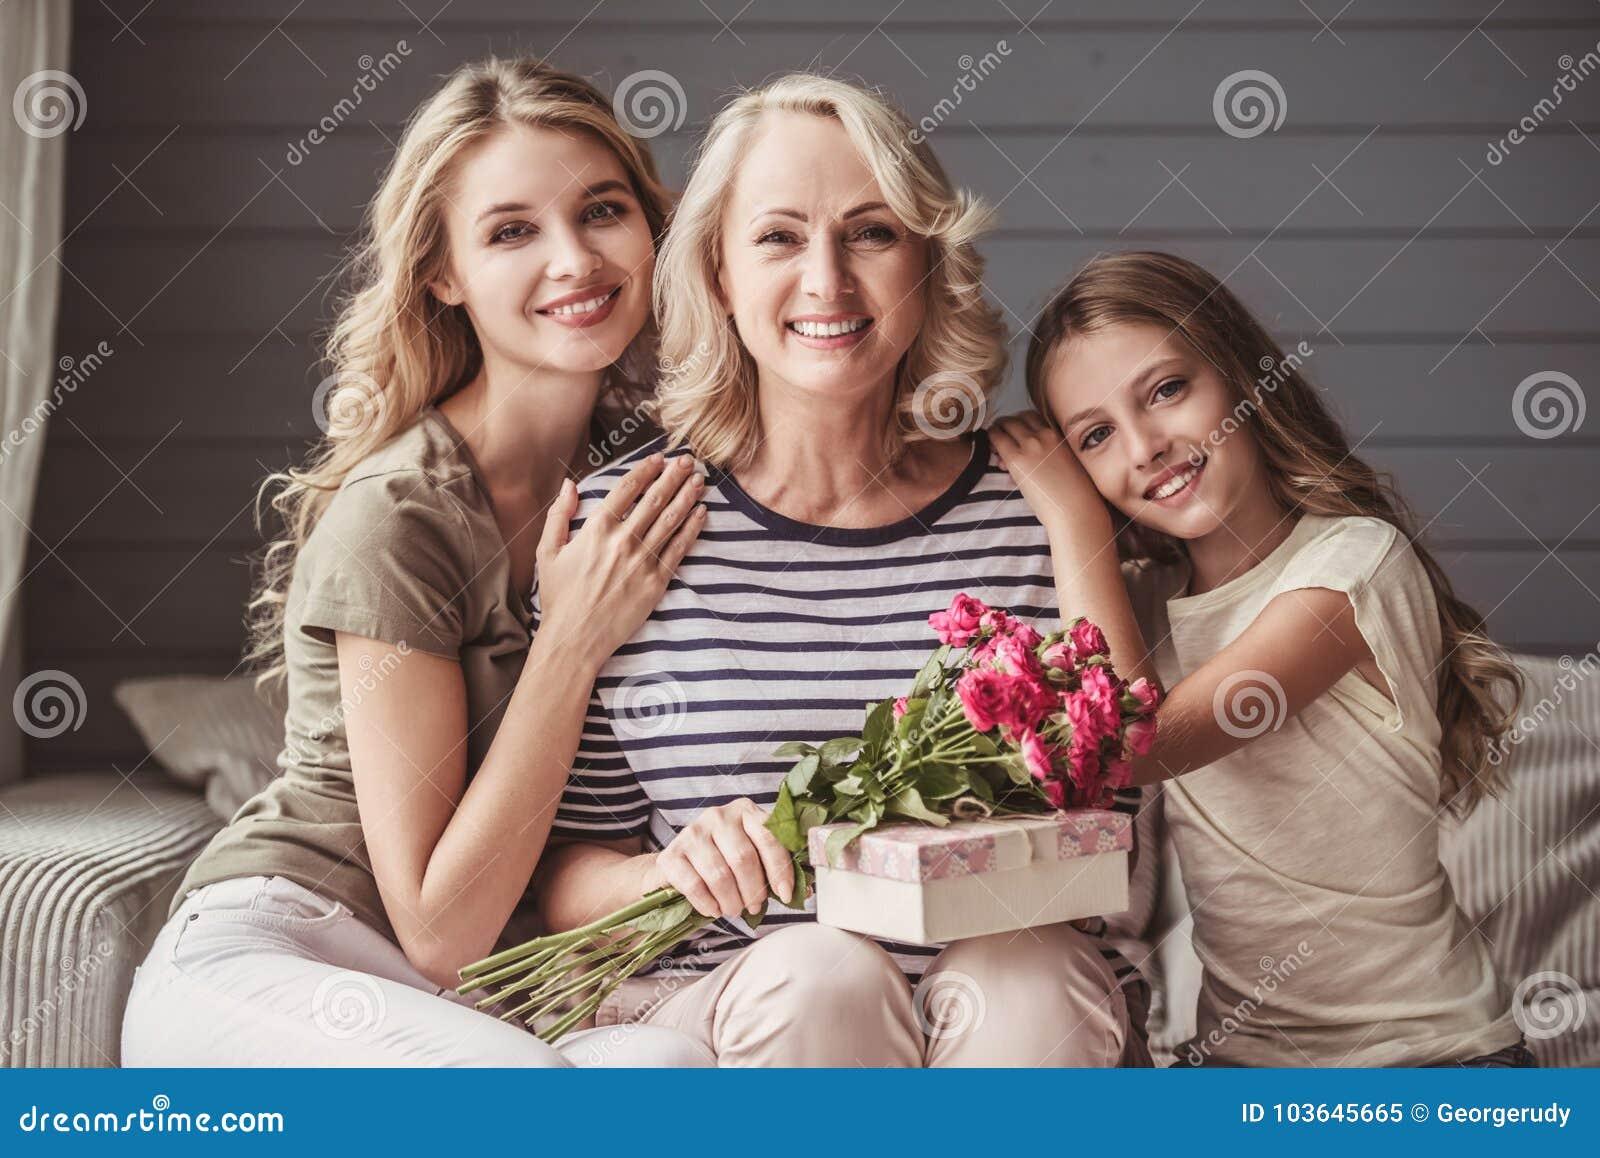 Grannys Holiday Greetings Stock Image Image Of Grandma 103645665